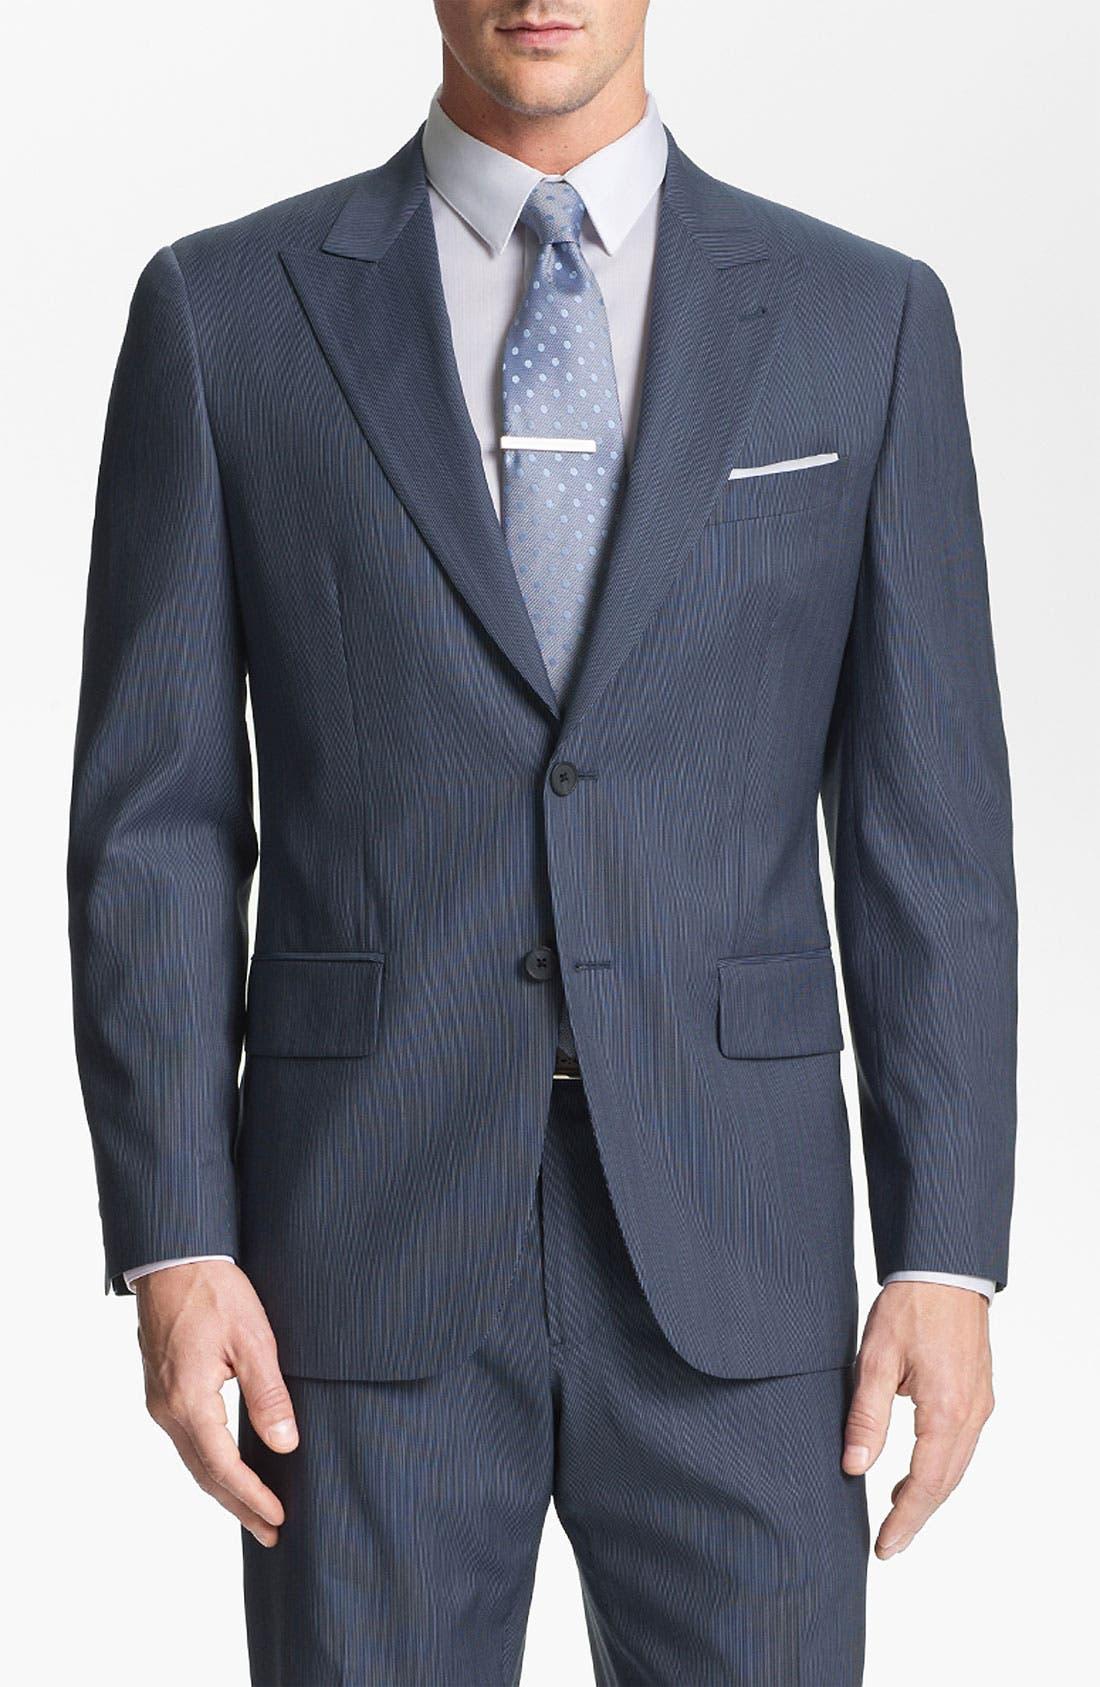 Alternate Image 1 Selected - Joseph Abboud 'Profile' Trim Fit Stripe Wool Suit